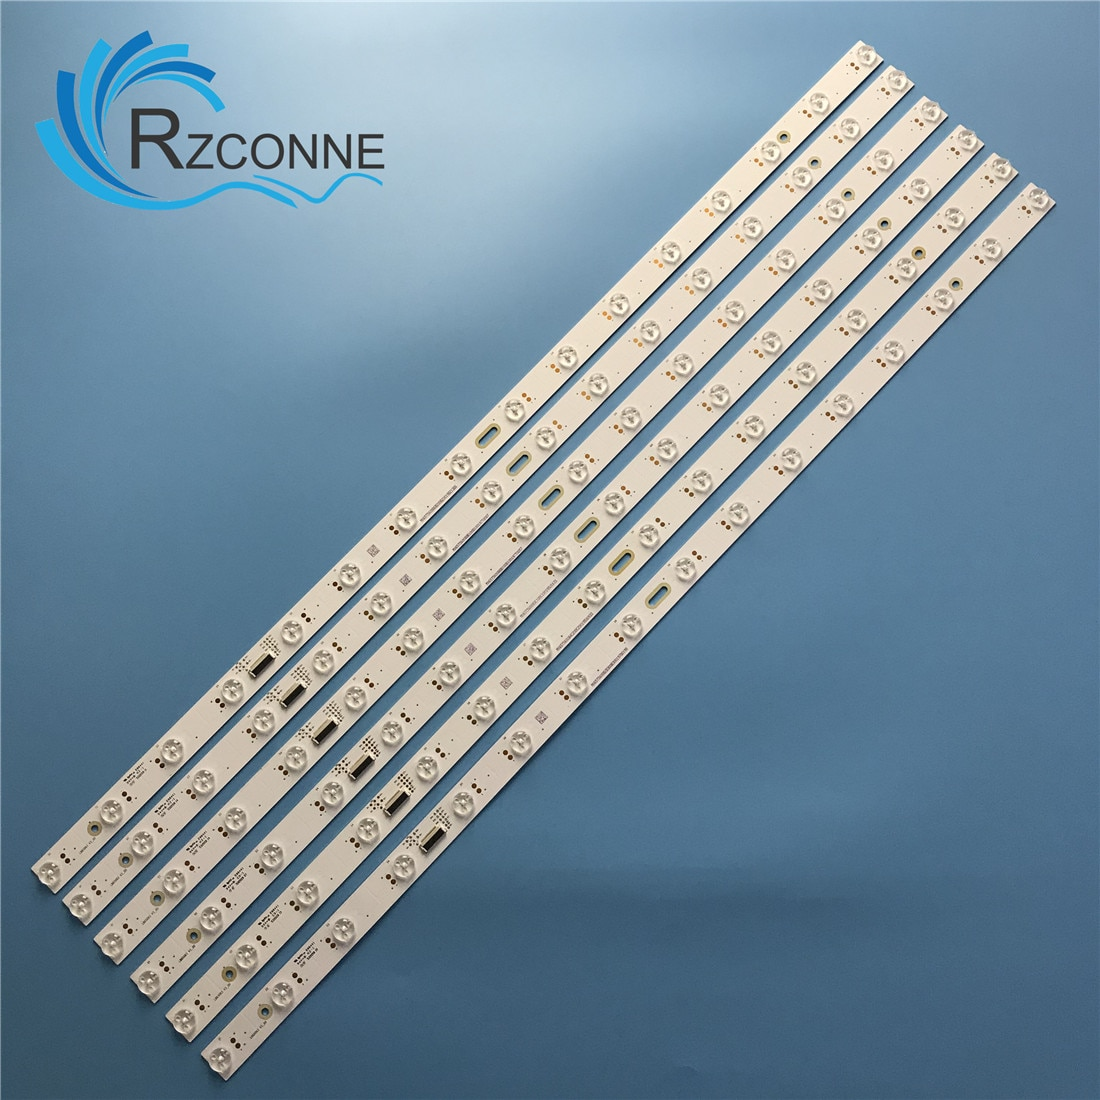 739 مللي متر LED شريط إضاءة خلفي 16 مصباح ل Vizio 65 ''التلفزيون LB65063 V3_00 PX65-G1 PQ65-F1 T650QVF09.0